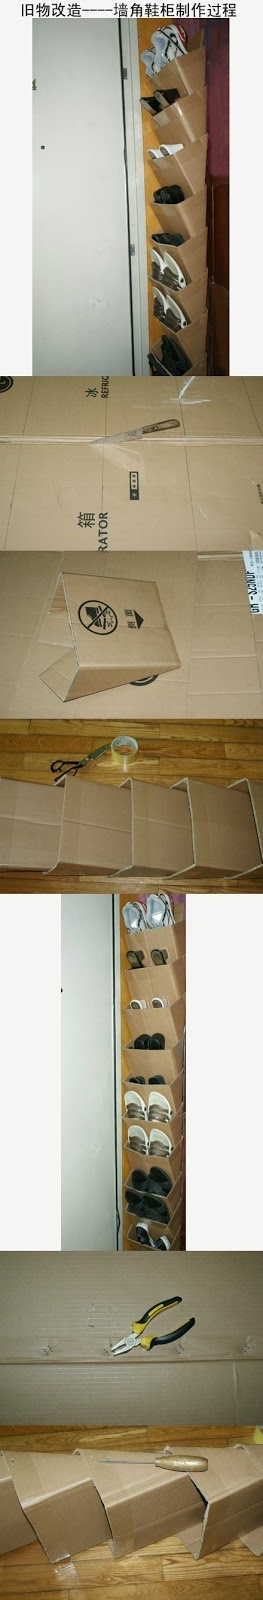 Homemade Vertical Cardboard Shoe Rack Project